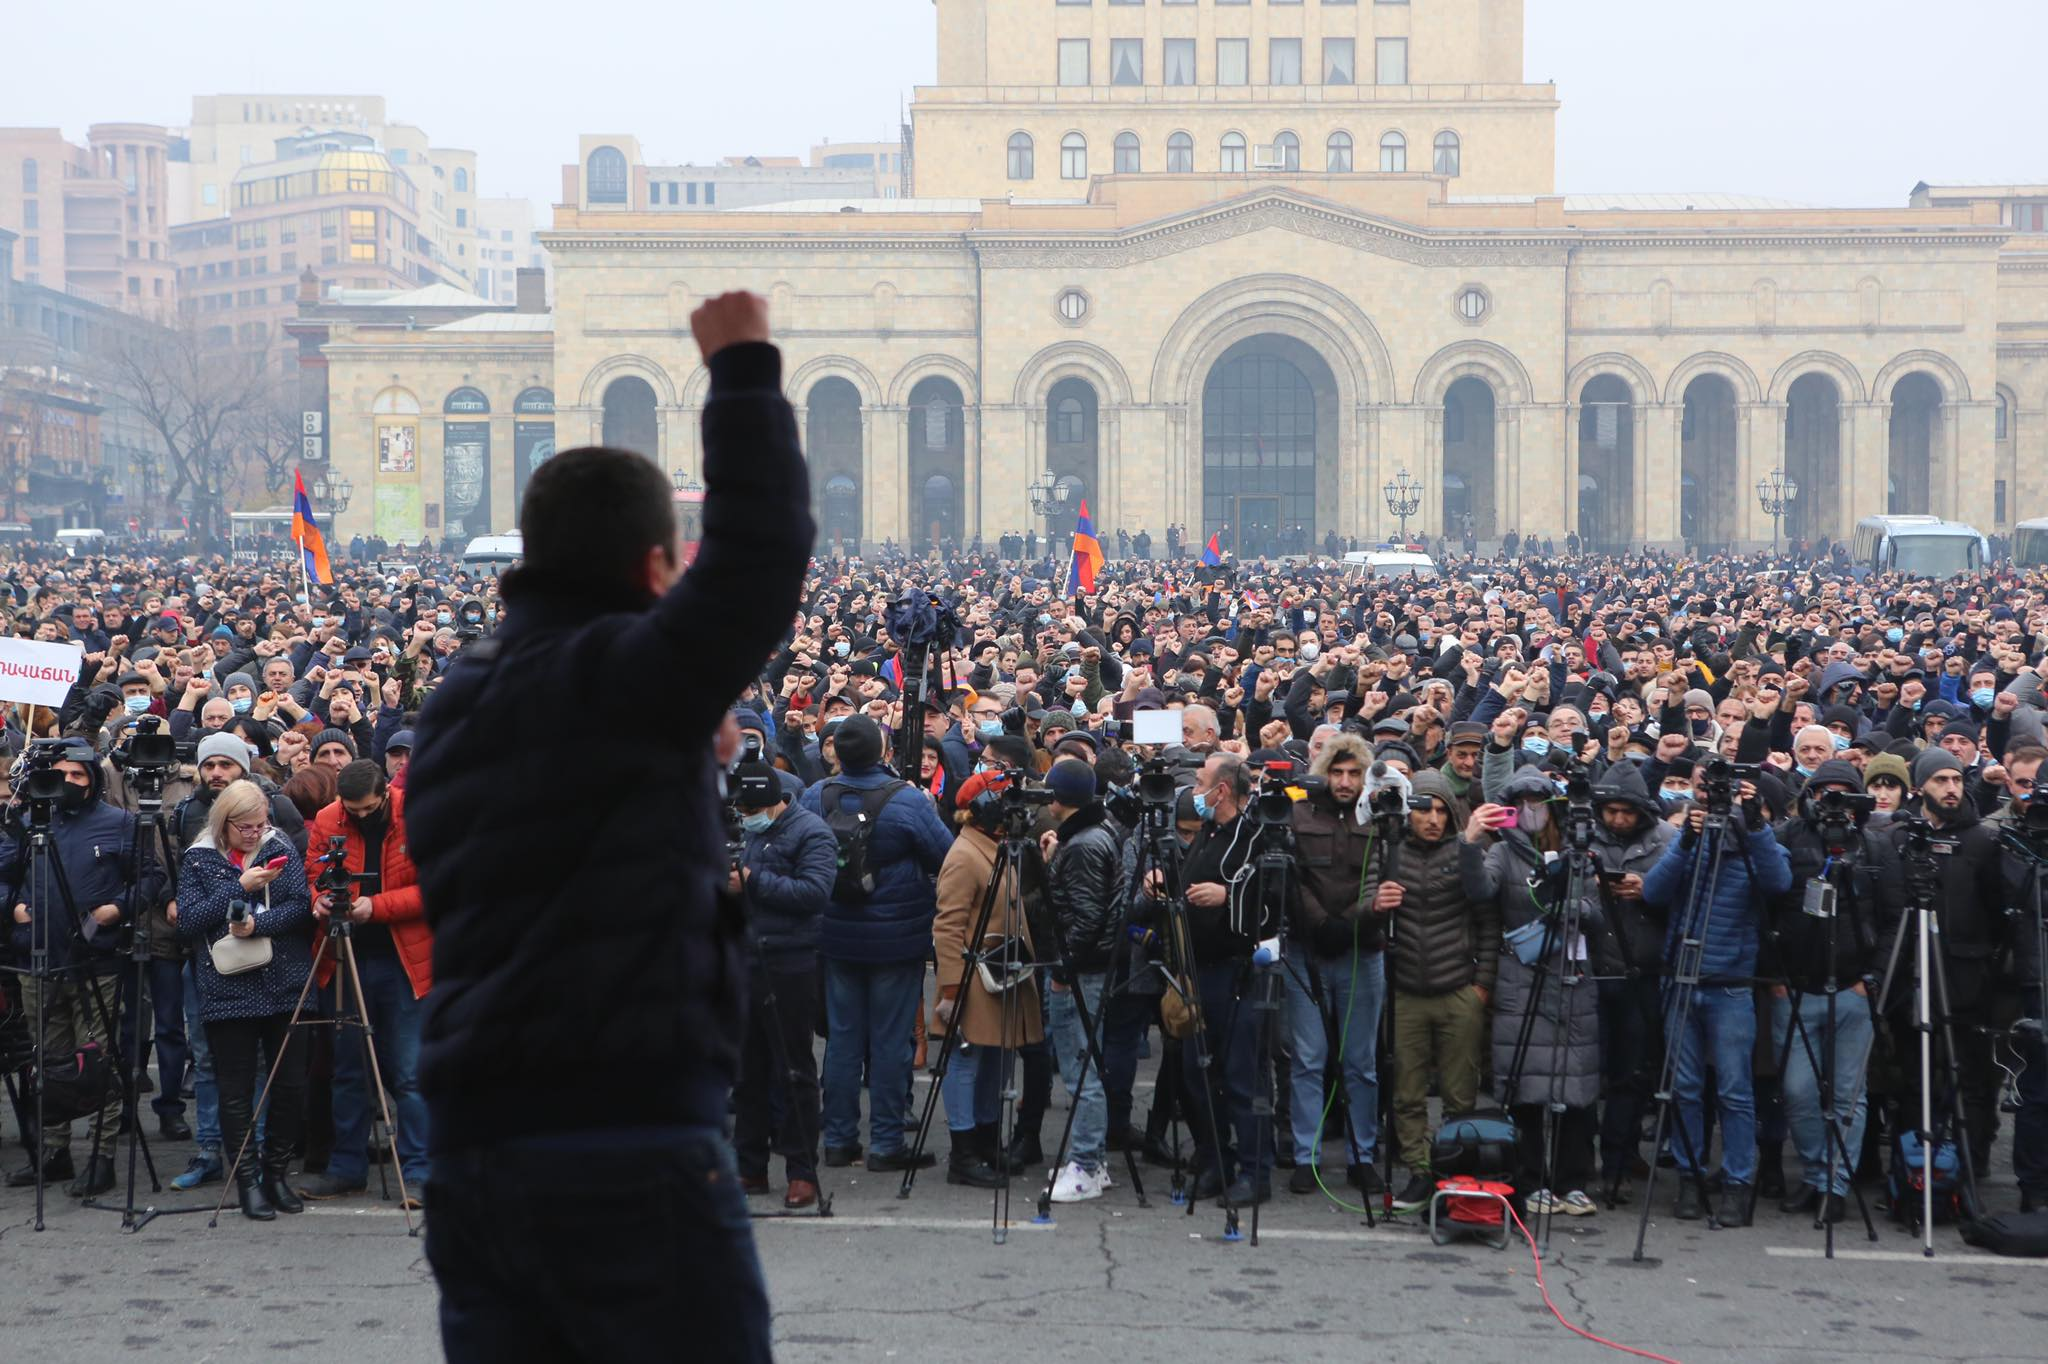 news Armenia, Nikol Pashinyan, opposition Armenia, Vazgen Manukyan, Yerevan, protest, strike, resignation of the prime minister,